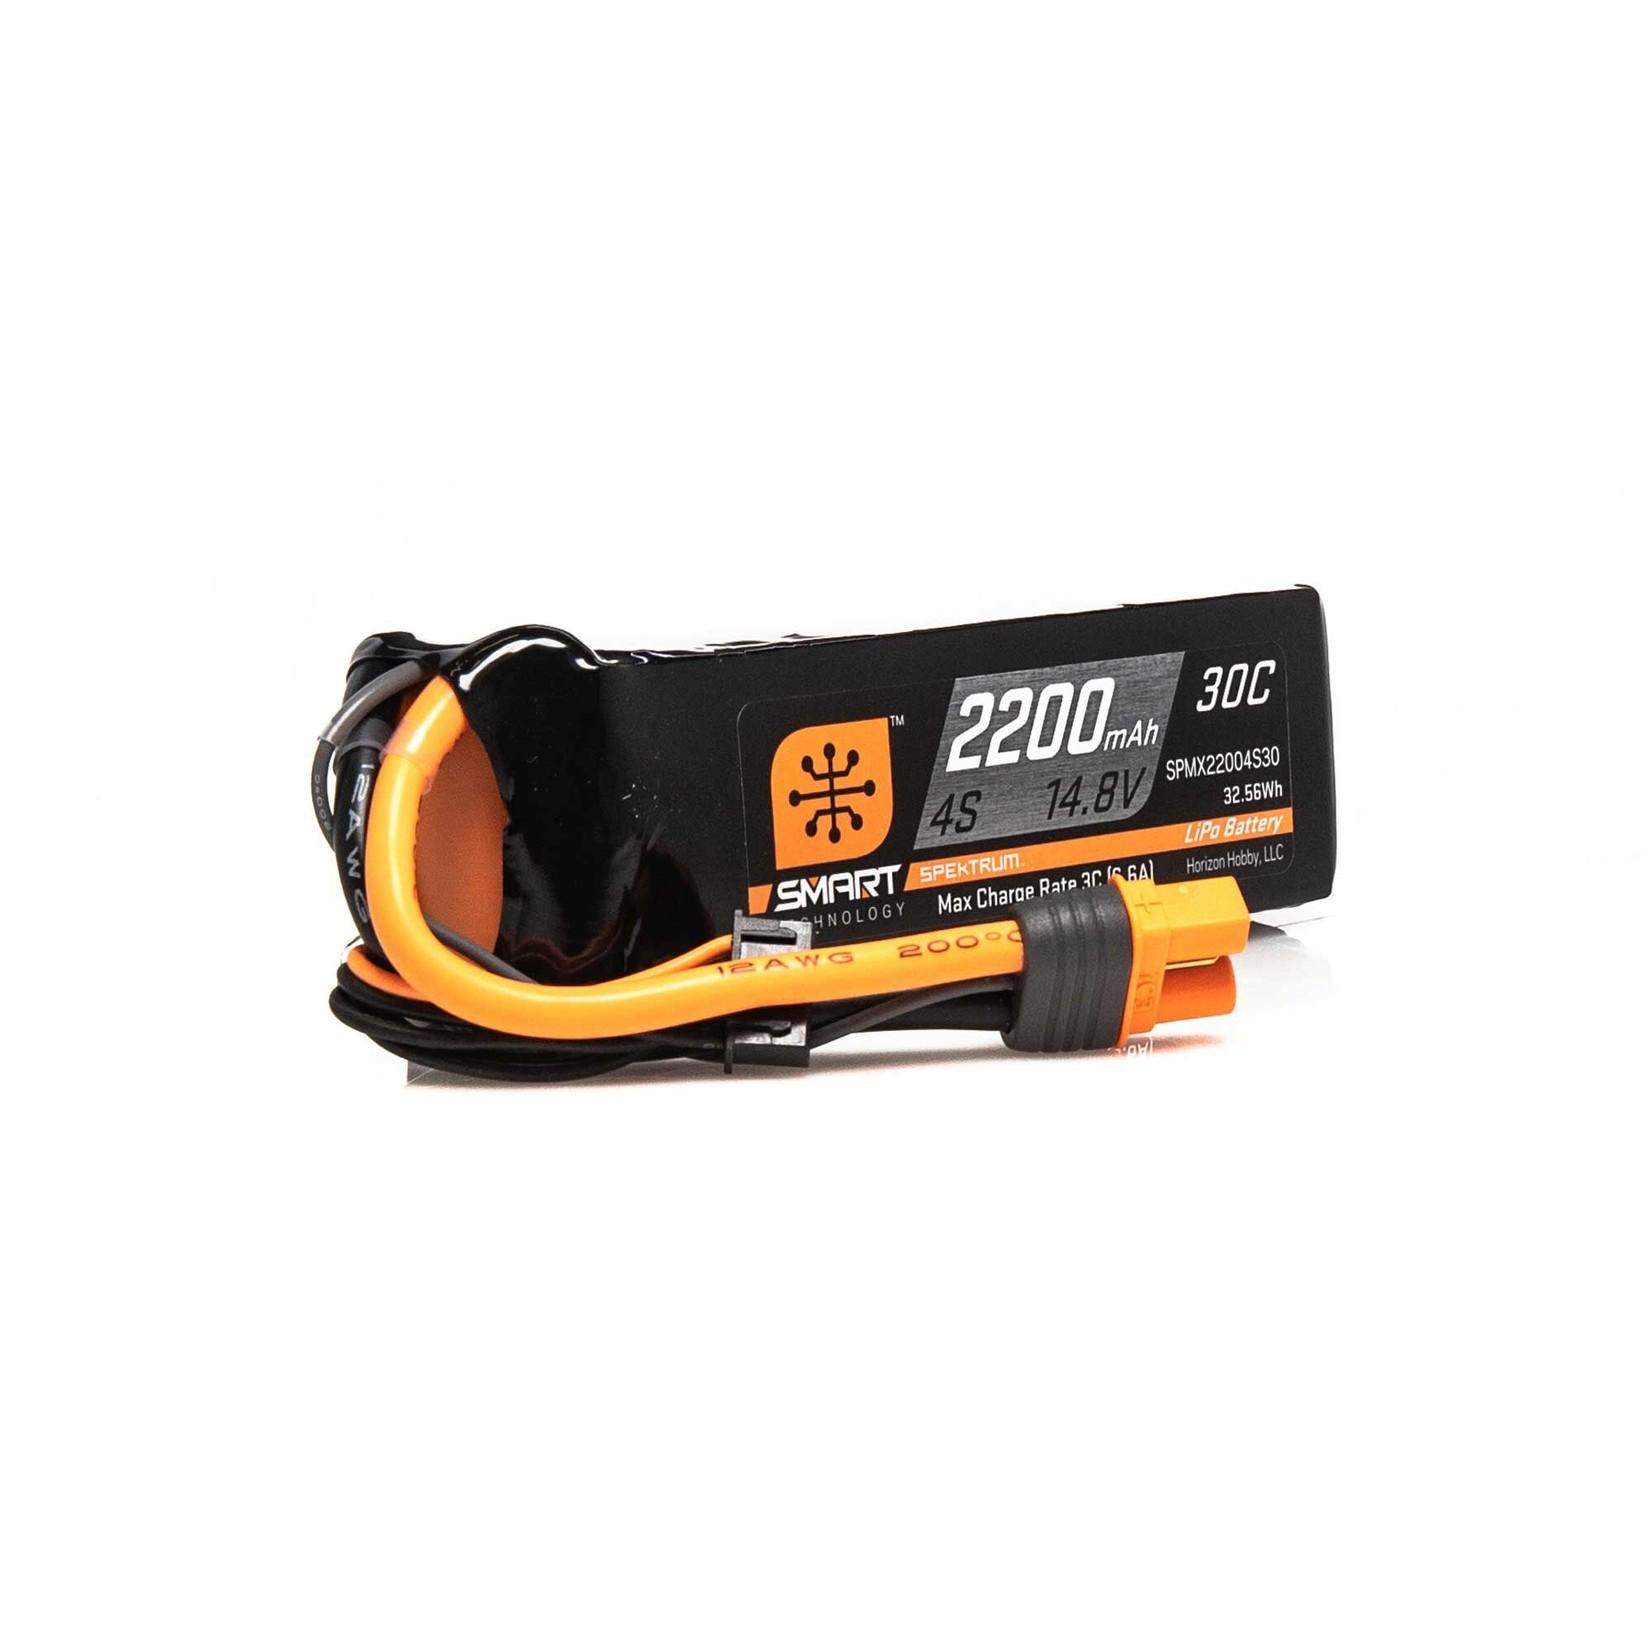 Spektrum SPMX22004S30 Spektrum 2200mAh 4S 14.8V Smart LiPo 30C; IC3